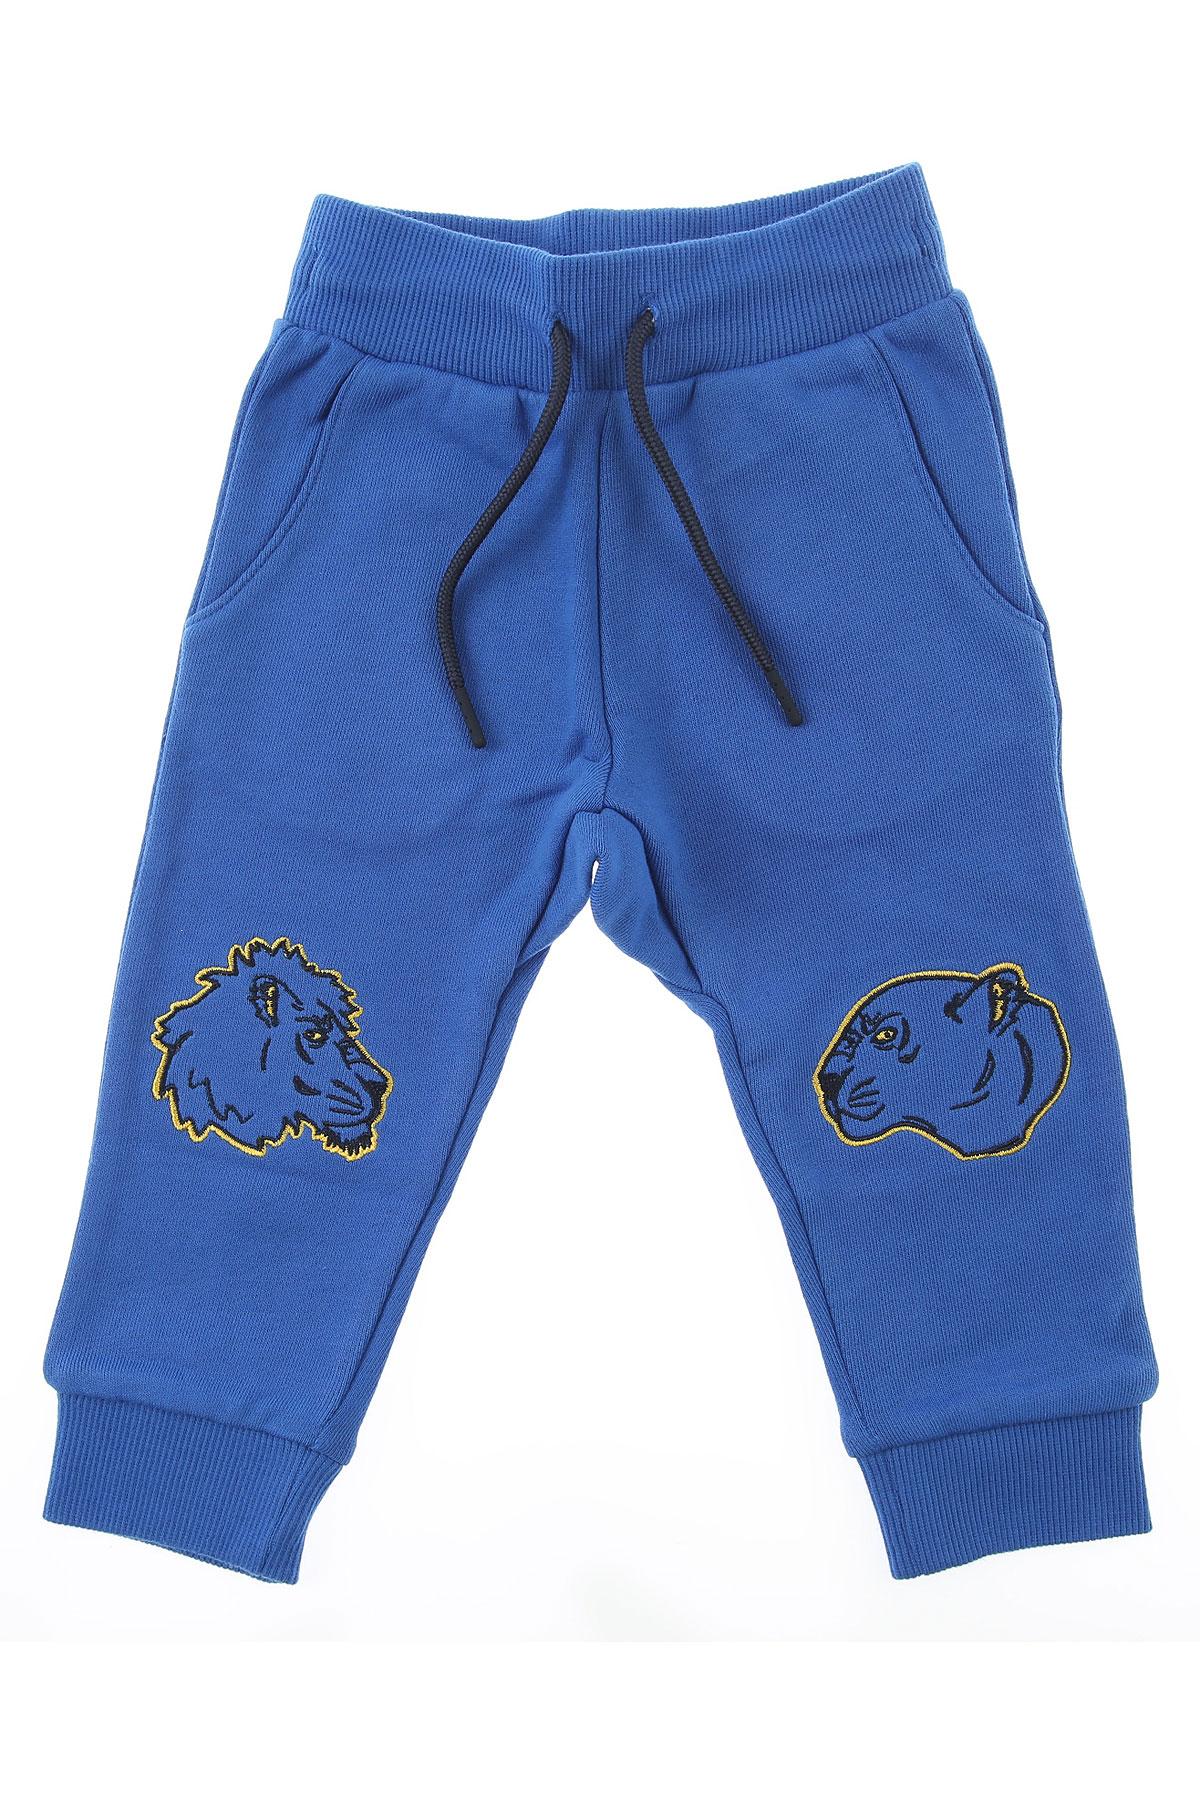 Kenzo Baby Sweatpants for Boys On Sale, Blue, Cotton, 2019, 12 M 2Y 3Y 6M 9 M